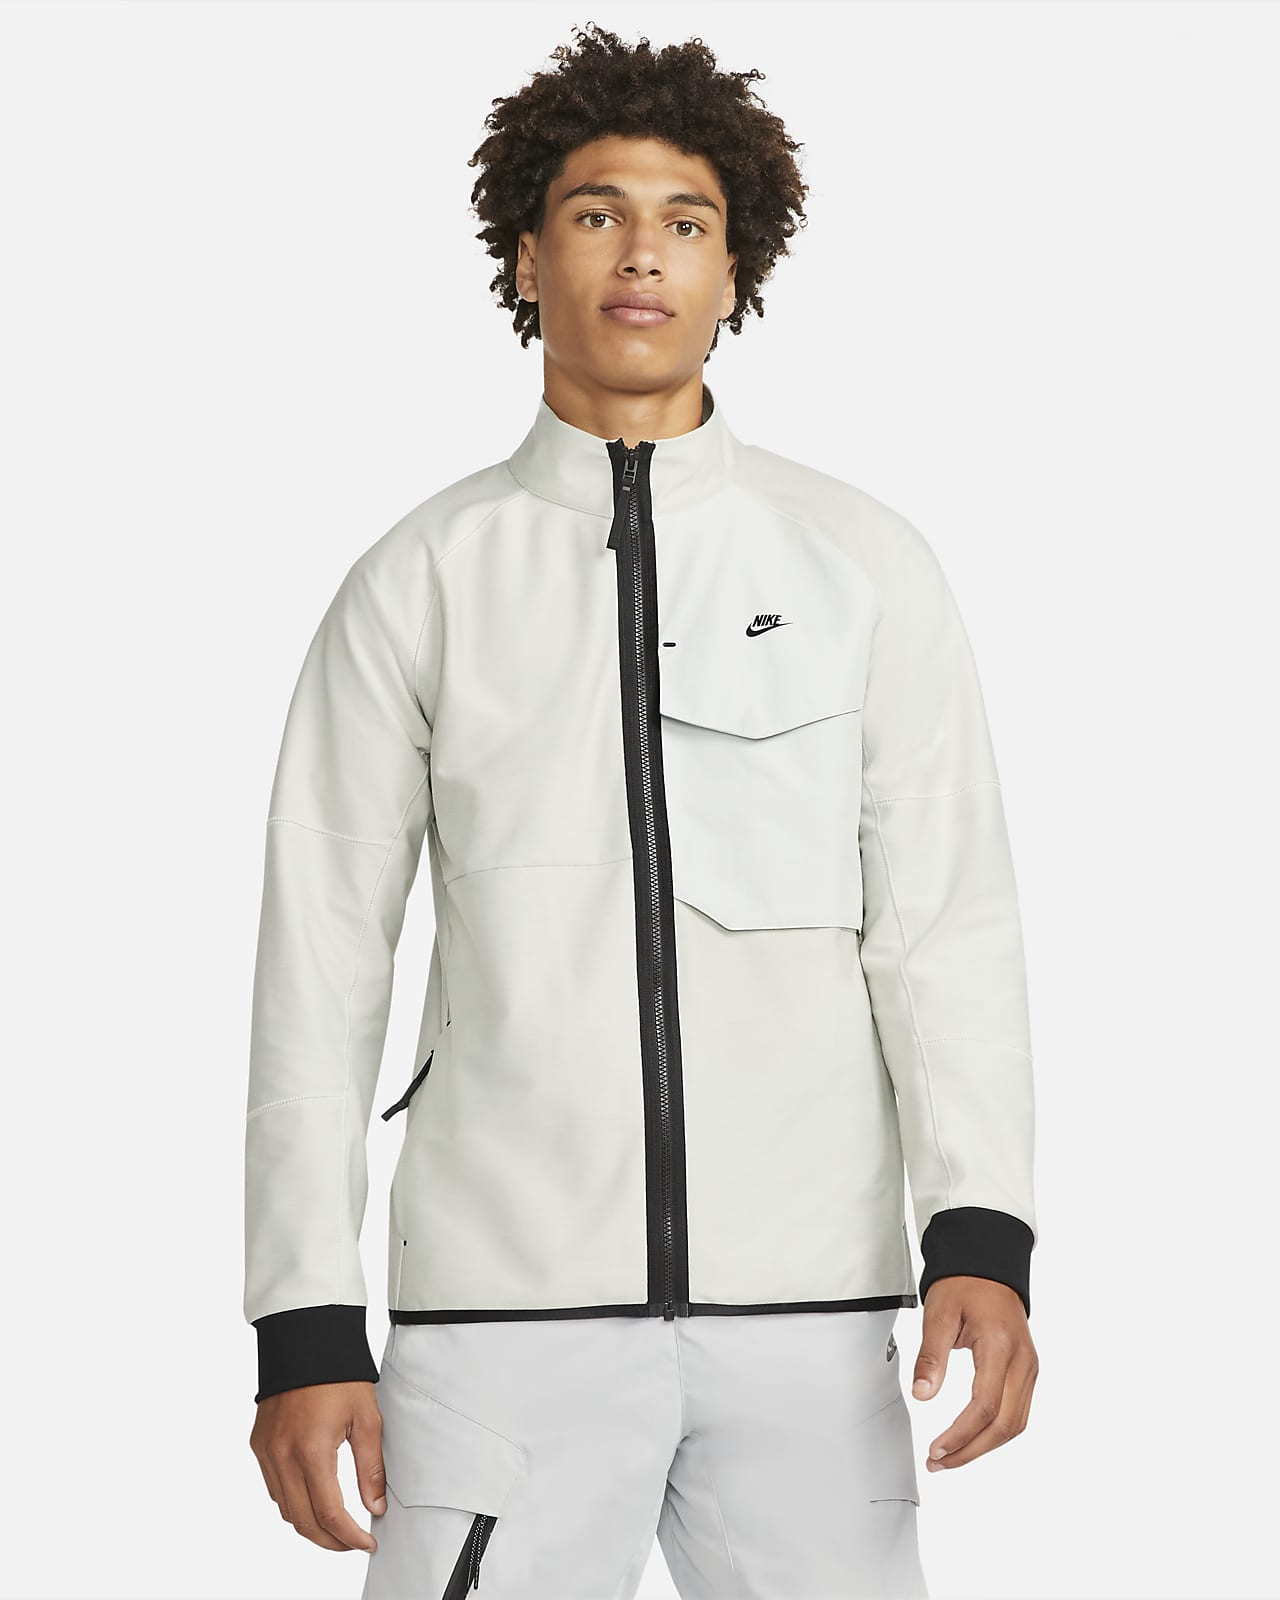 Nike Sportswear Dri-FIT Tech Pack-løbejakke uden for til mænd